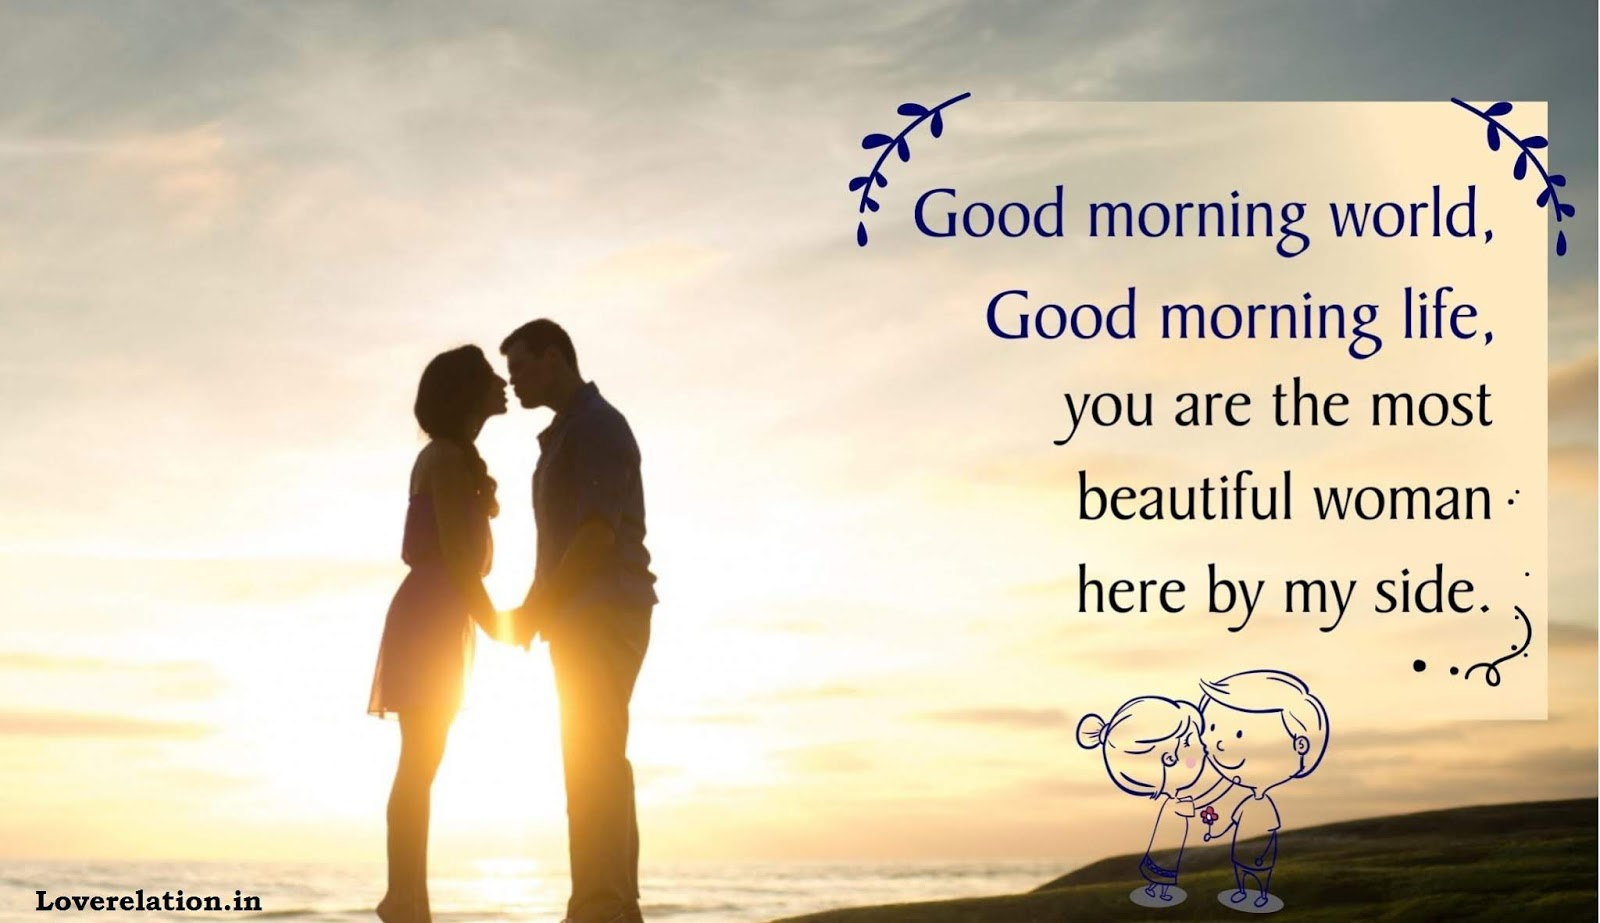 Romanticcute 50good Morning Images For Girlfriendlover Love